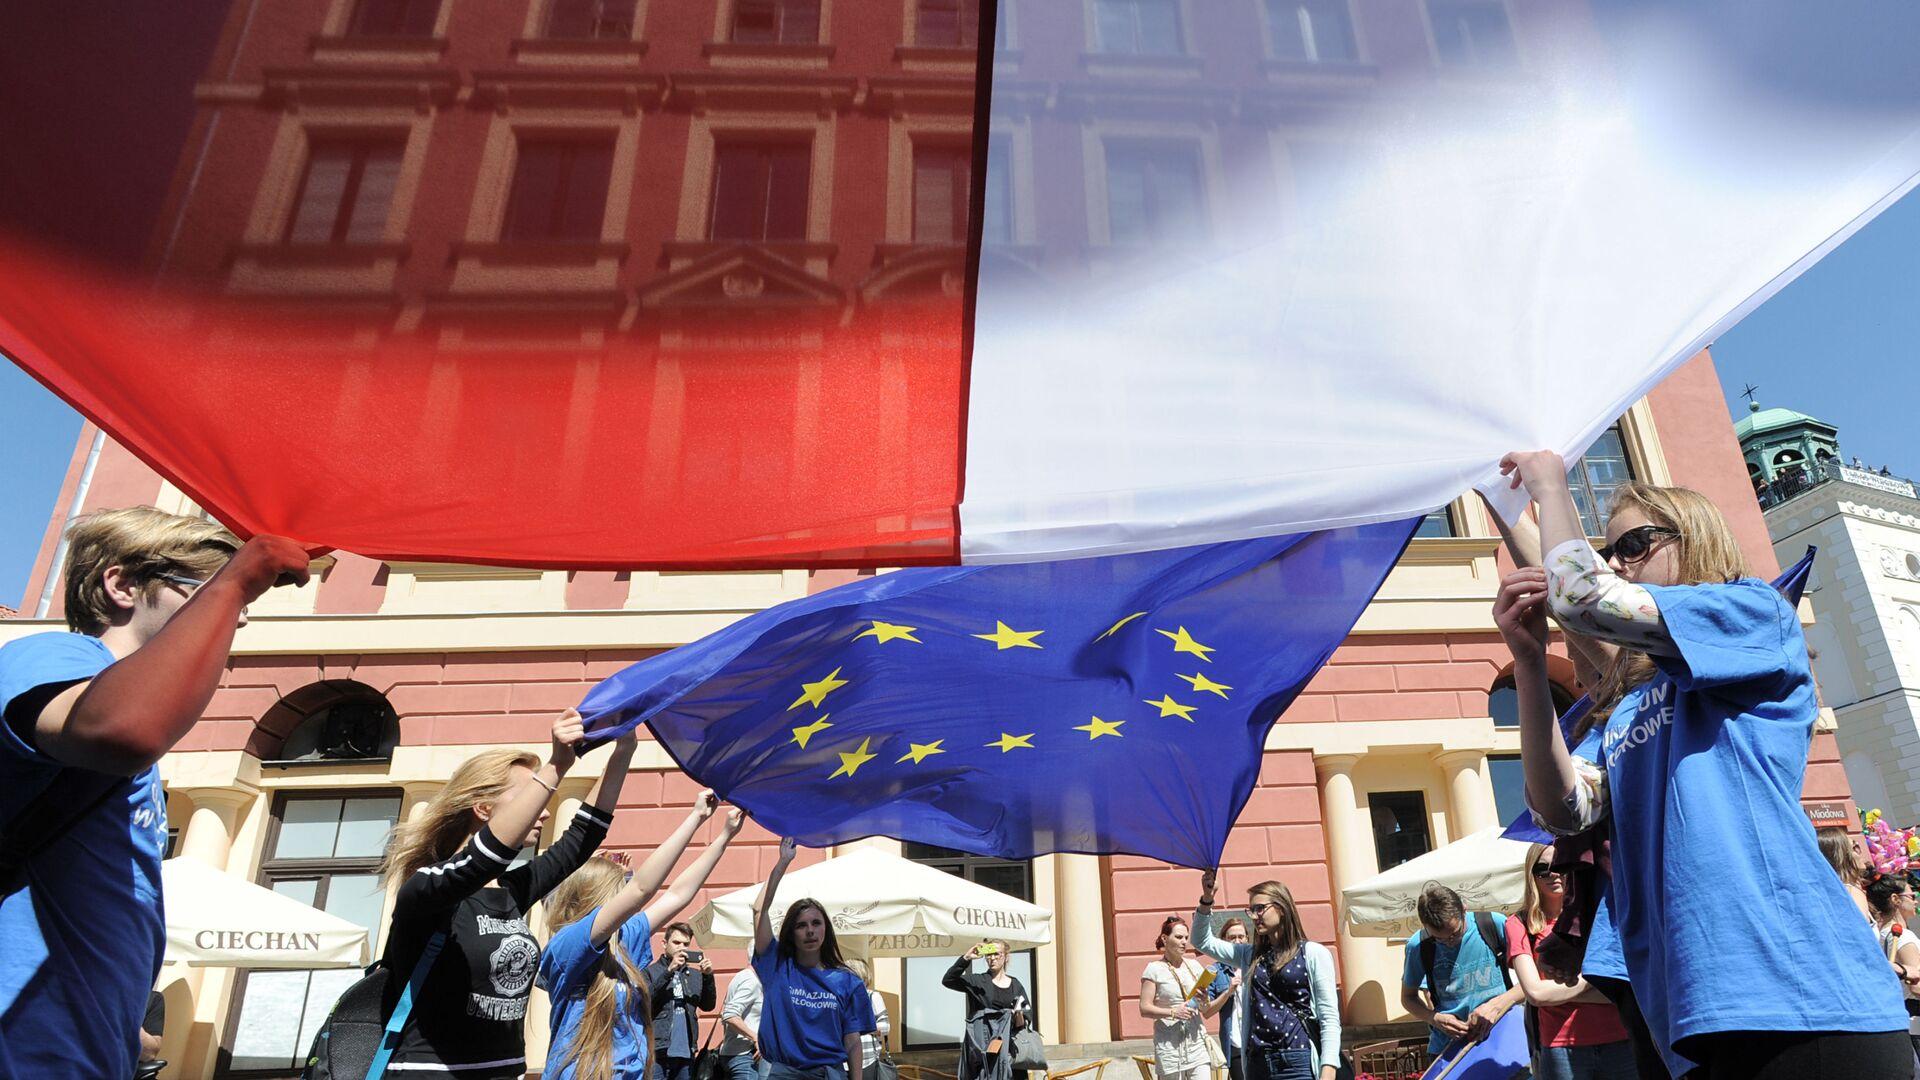 Vlajky Polska a EU - Sputnik Česká republika, 1920, 08.10.2021